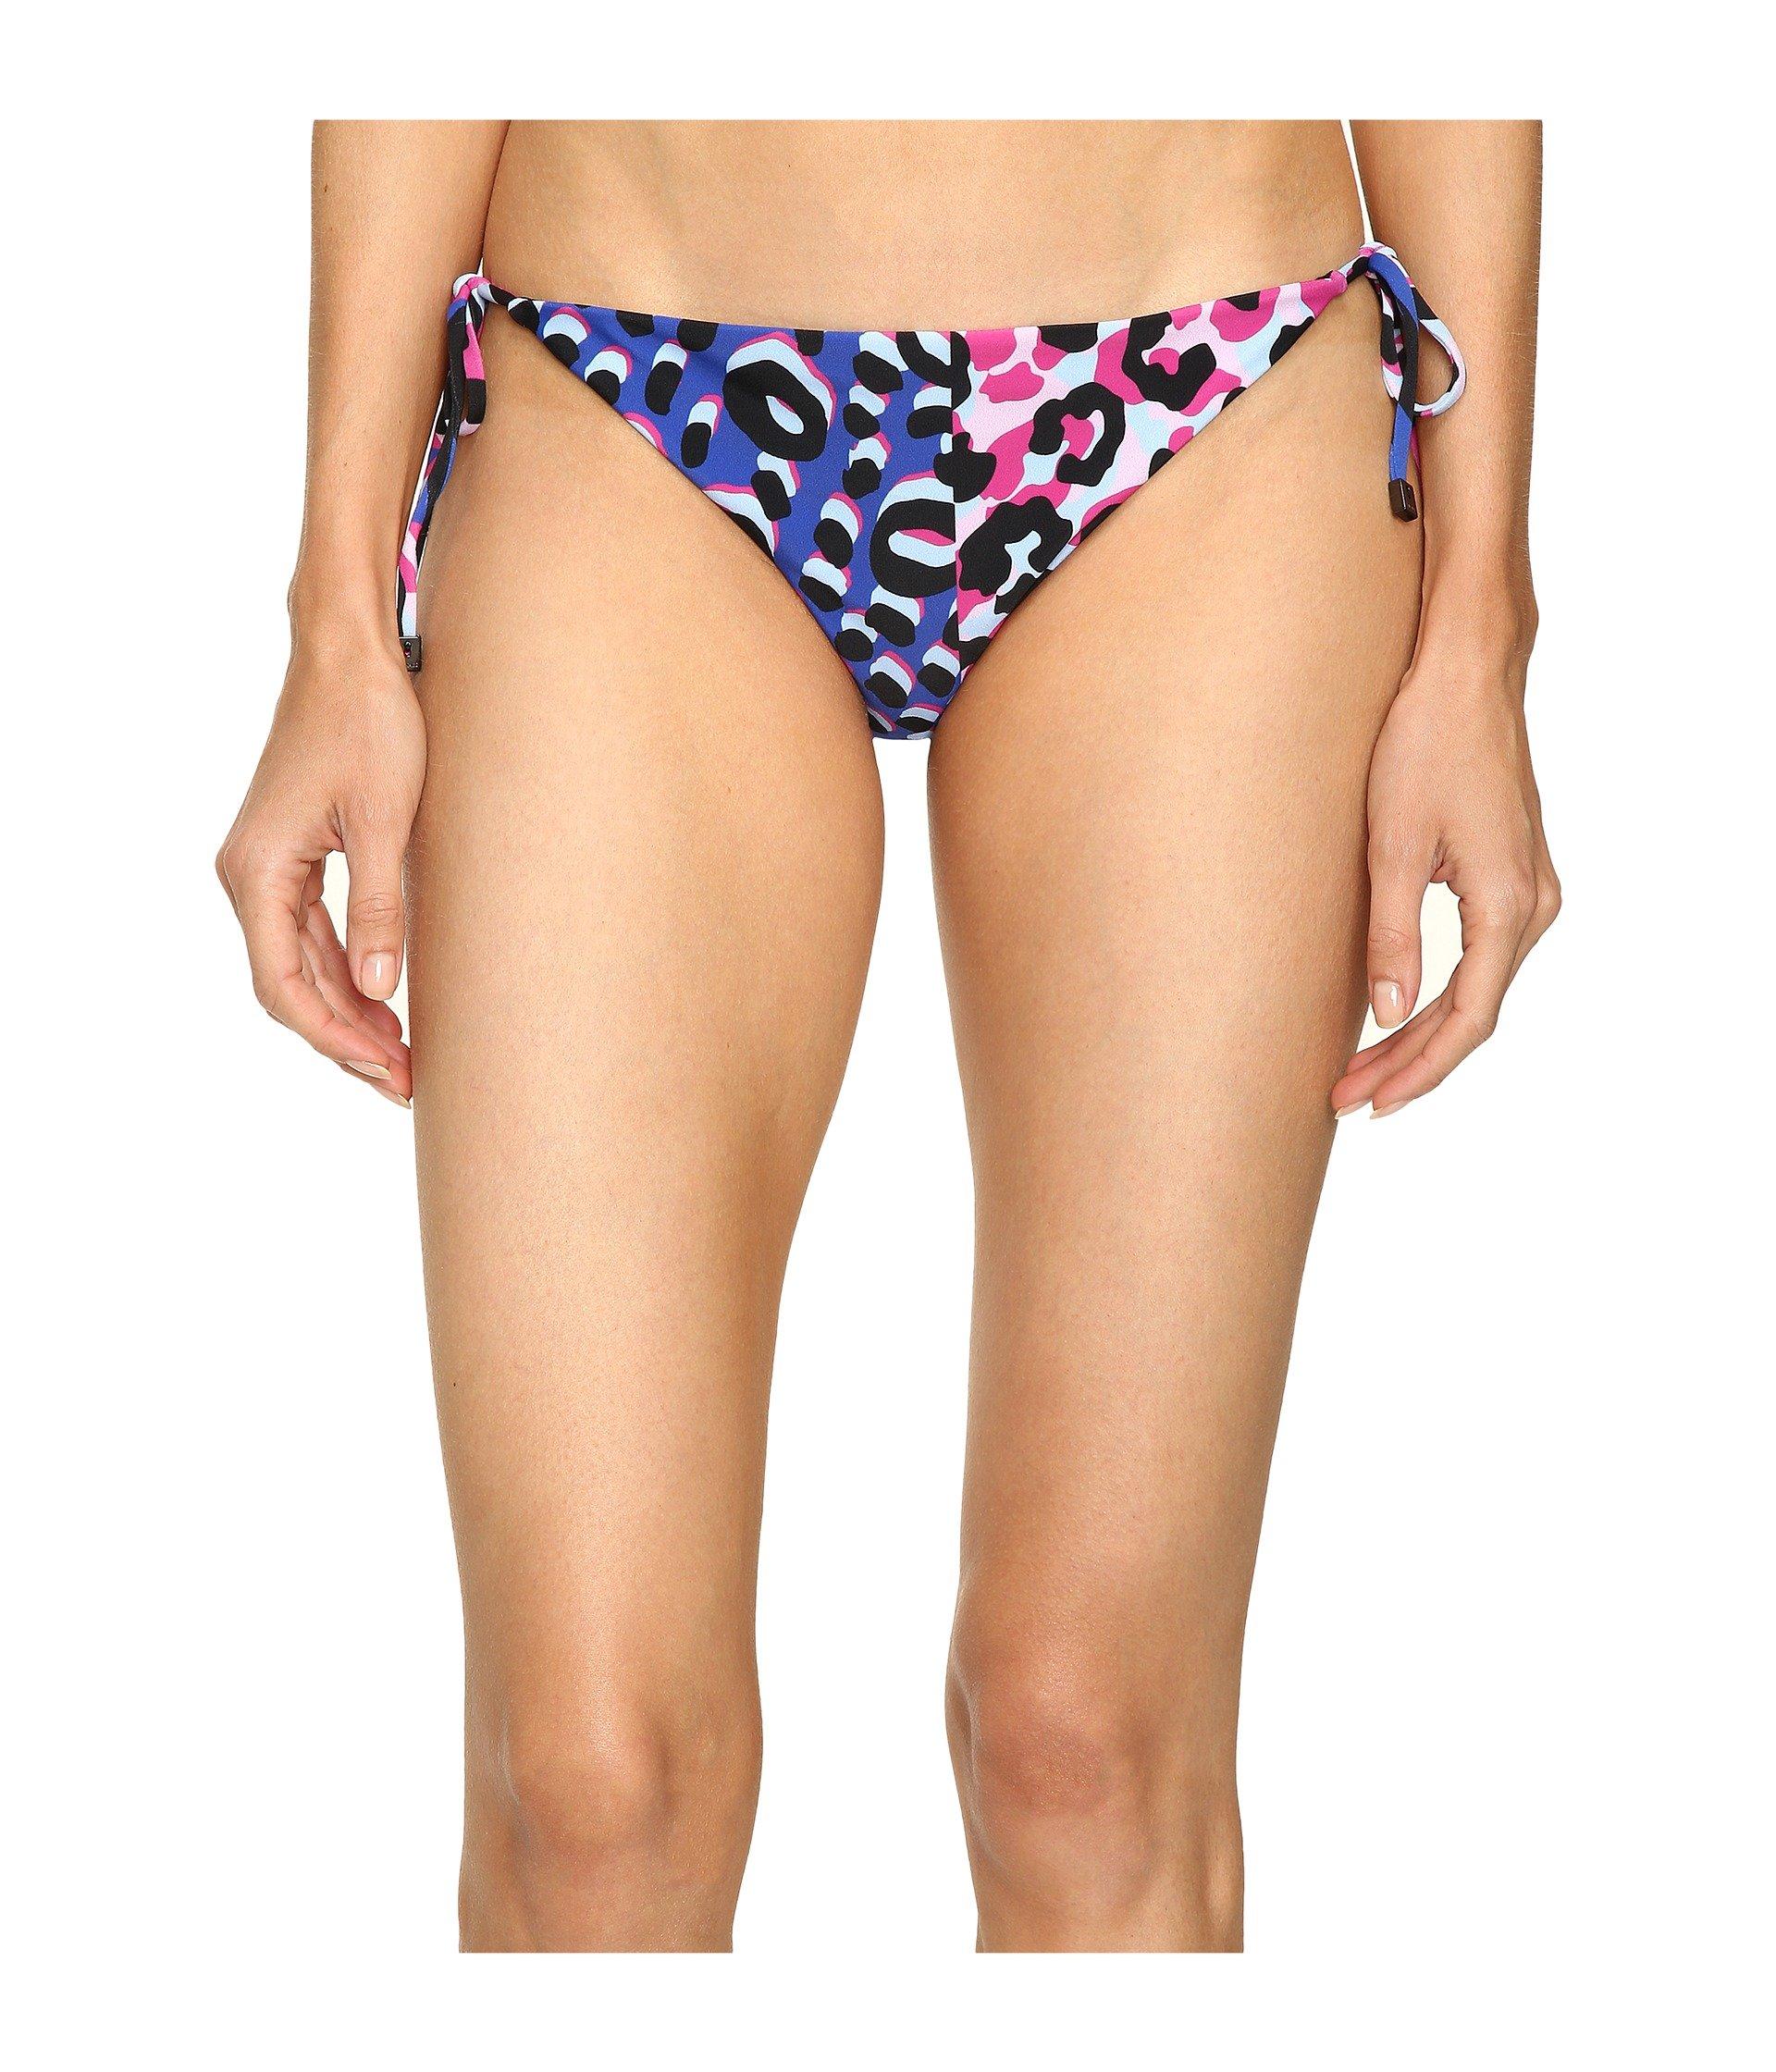 Bikini para Mujer Versace Animalier Tie Bikini Bottom  + Versace en VeoyCompro.net